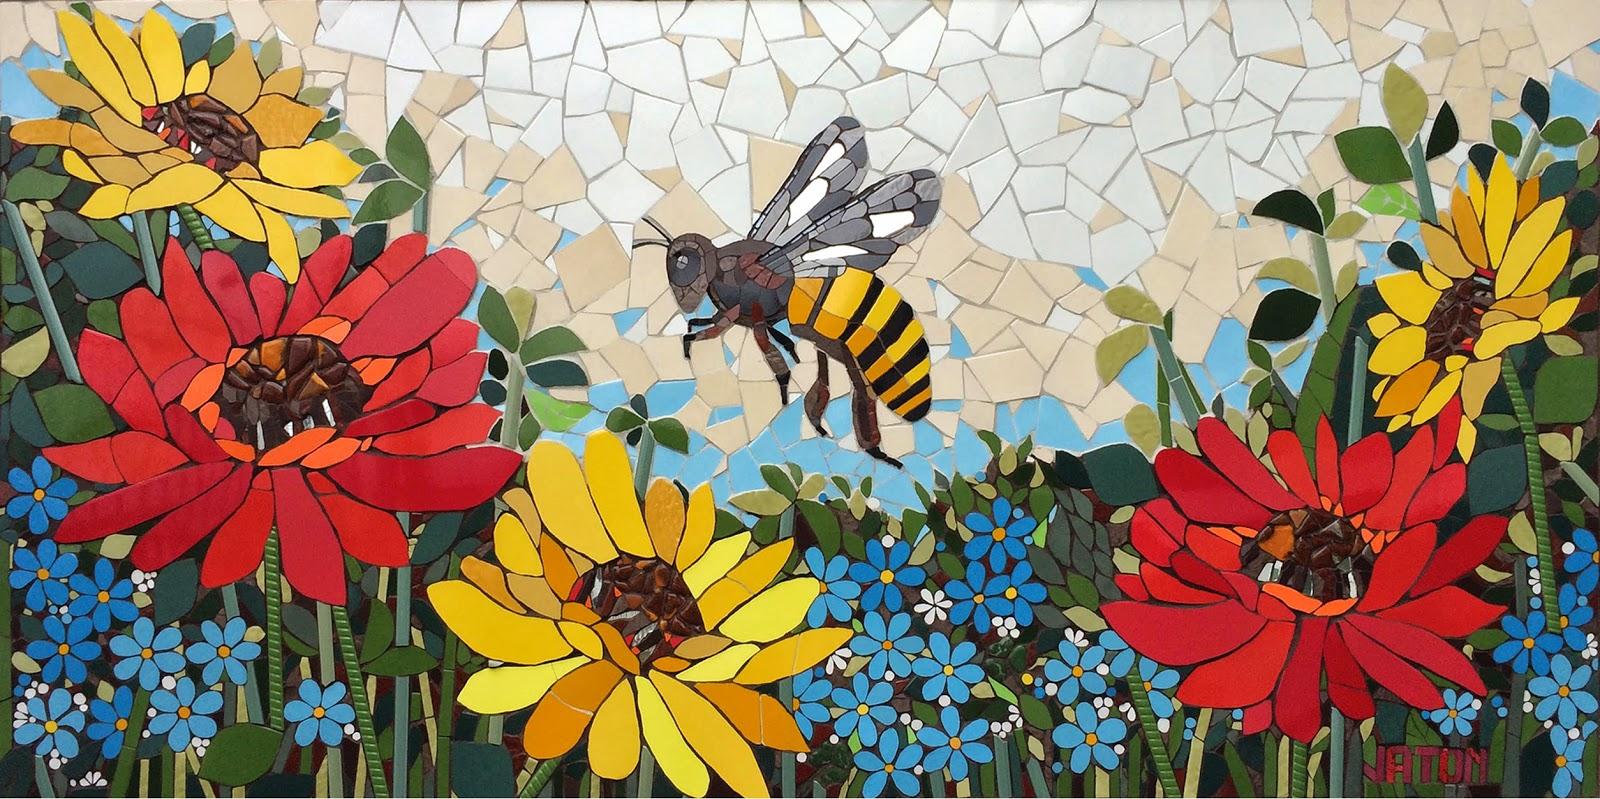 Mosaico creativo de fj mosaic art murales for El mural de mosaicos